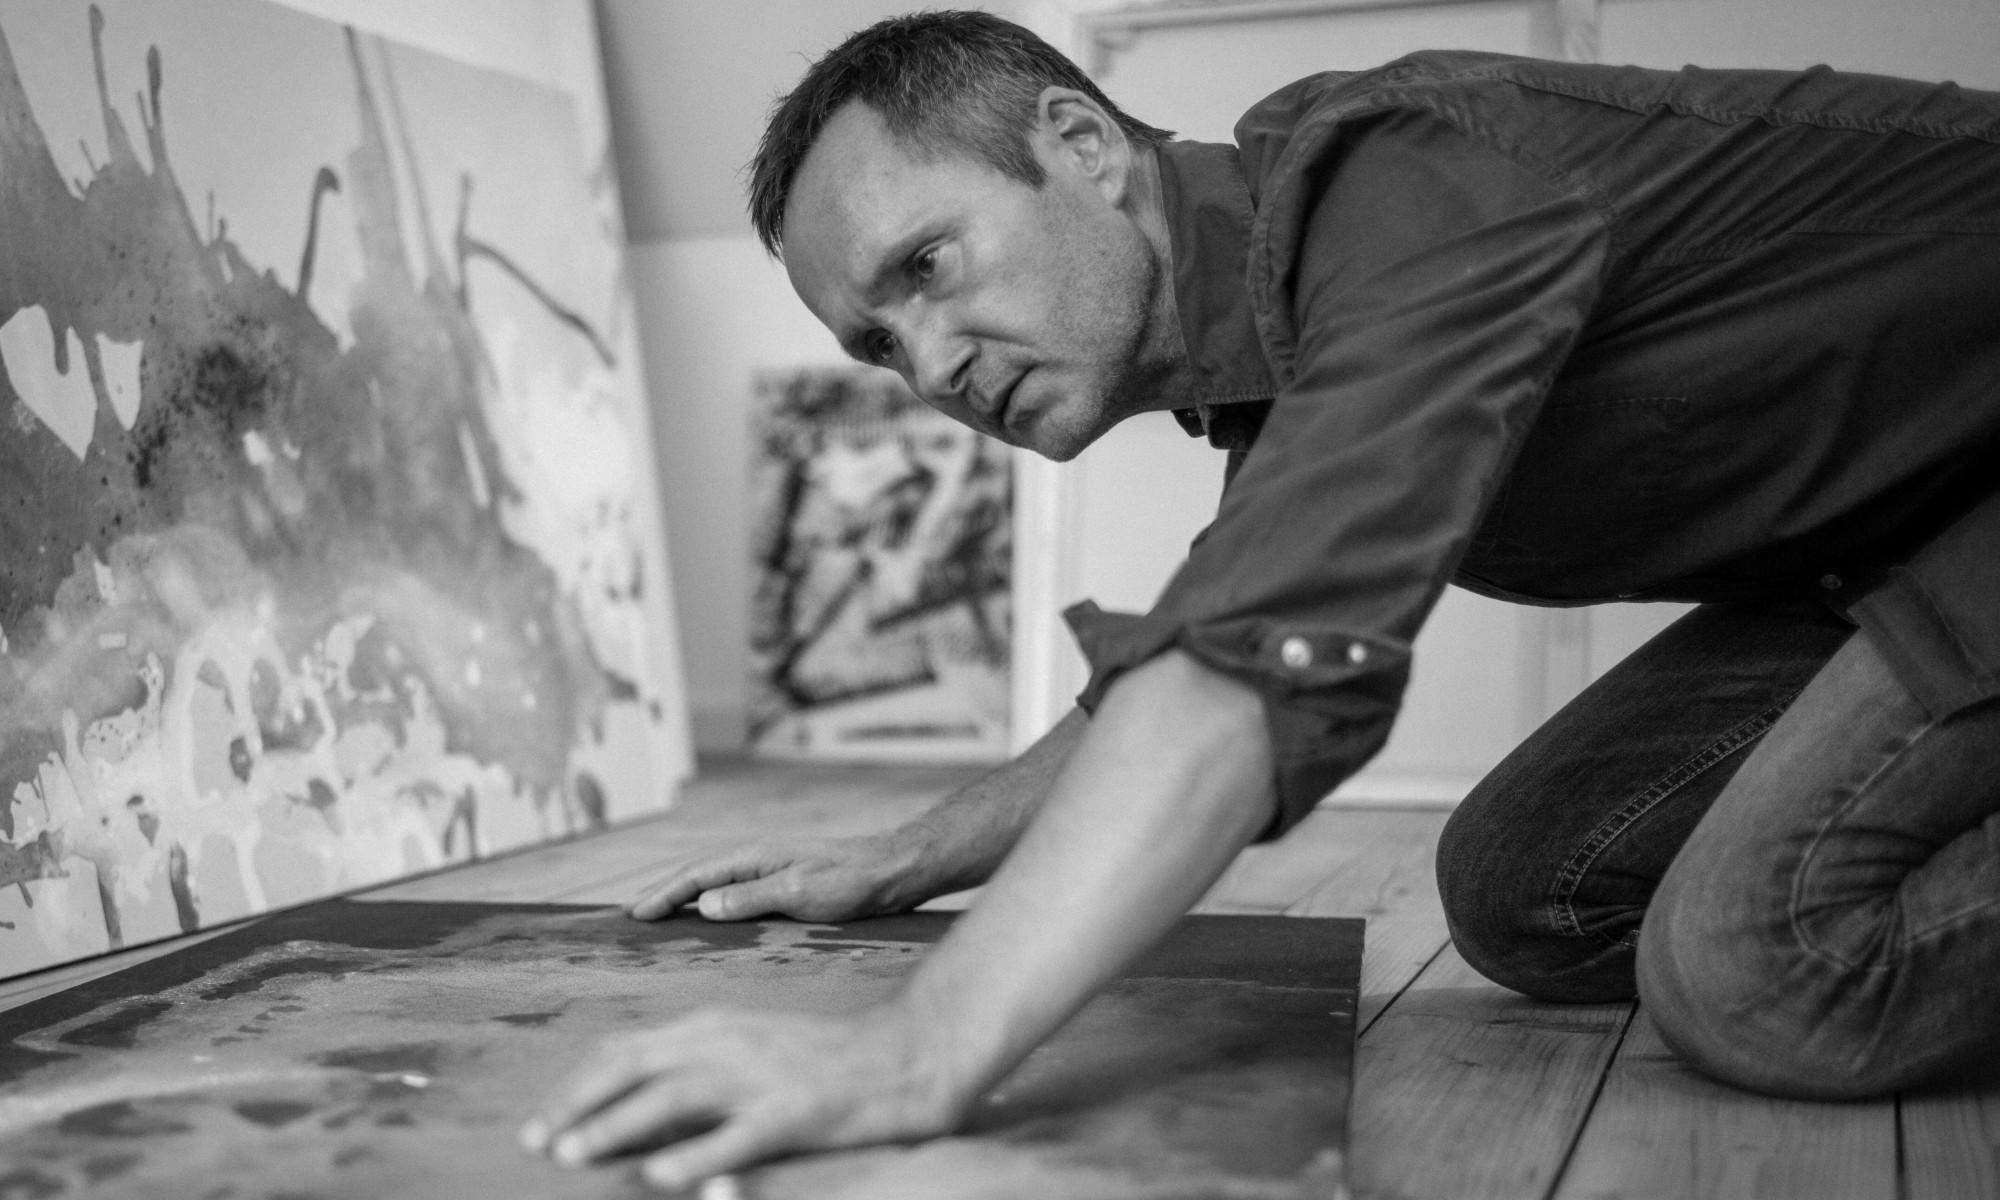 Bildender Künstler - Maler